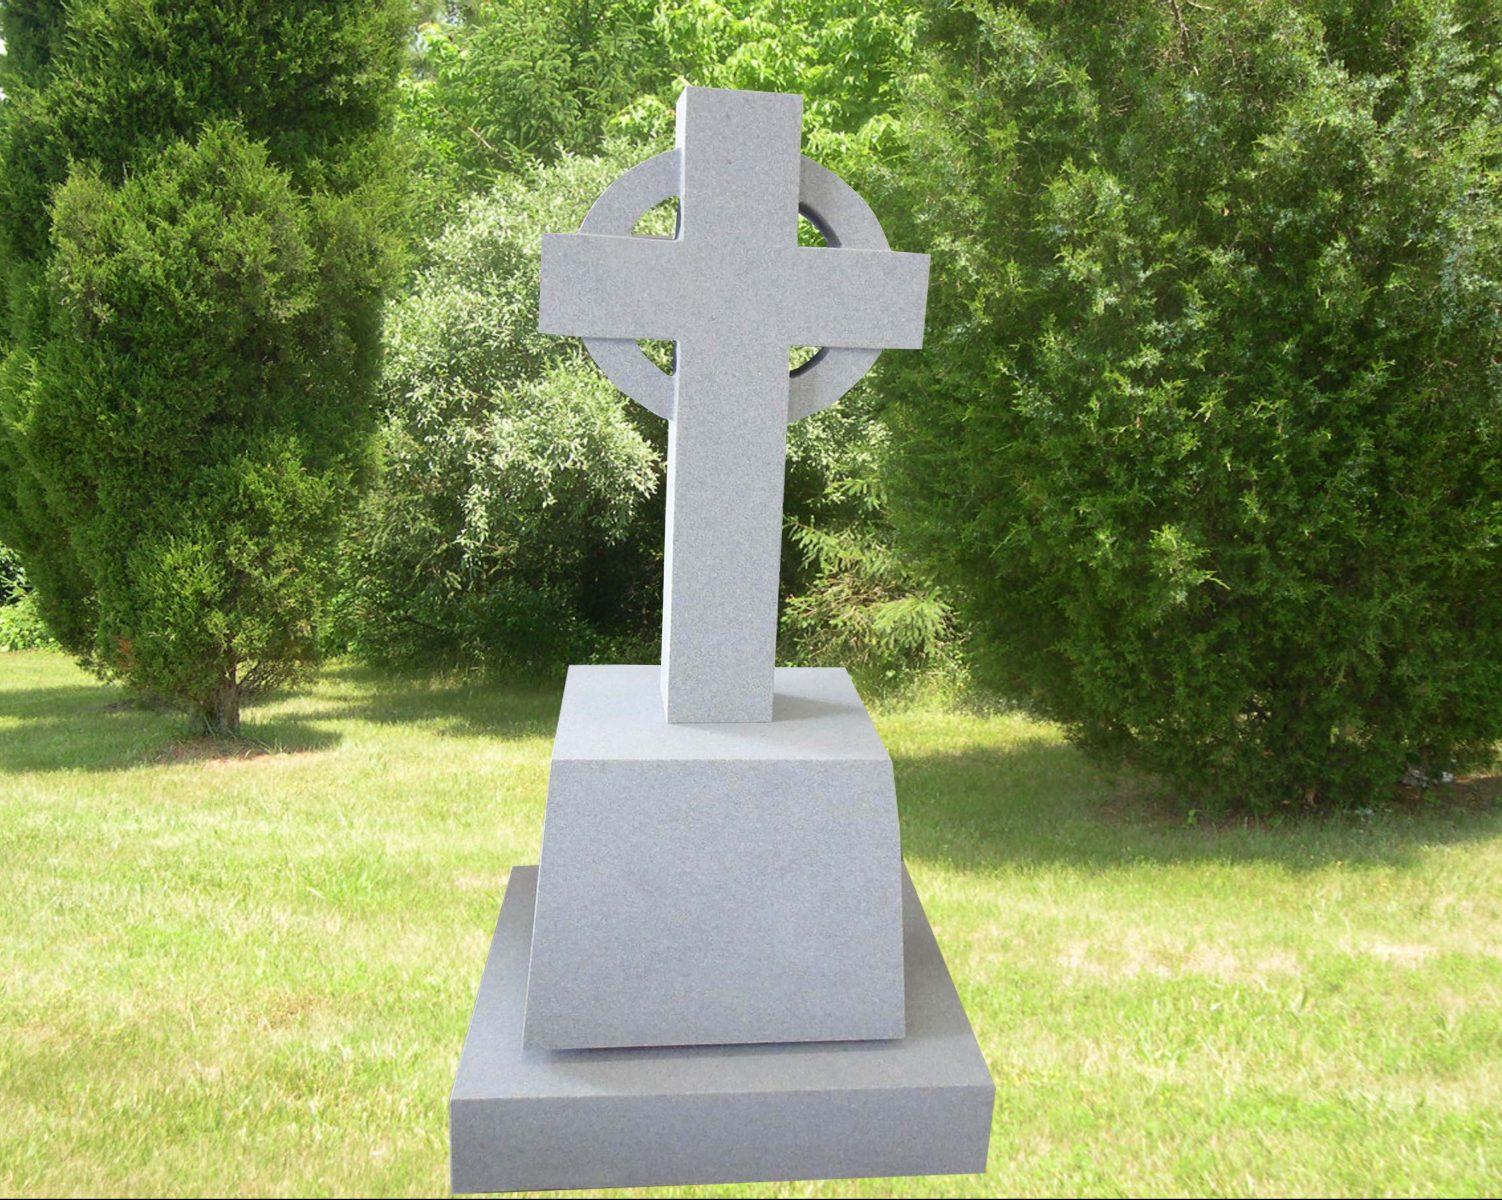 EG-12-401-905 / Fine Gray / All Steeled Simple Celtic Cross